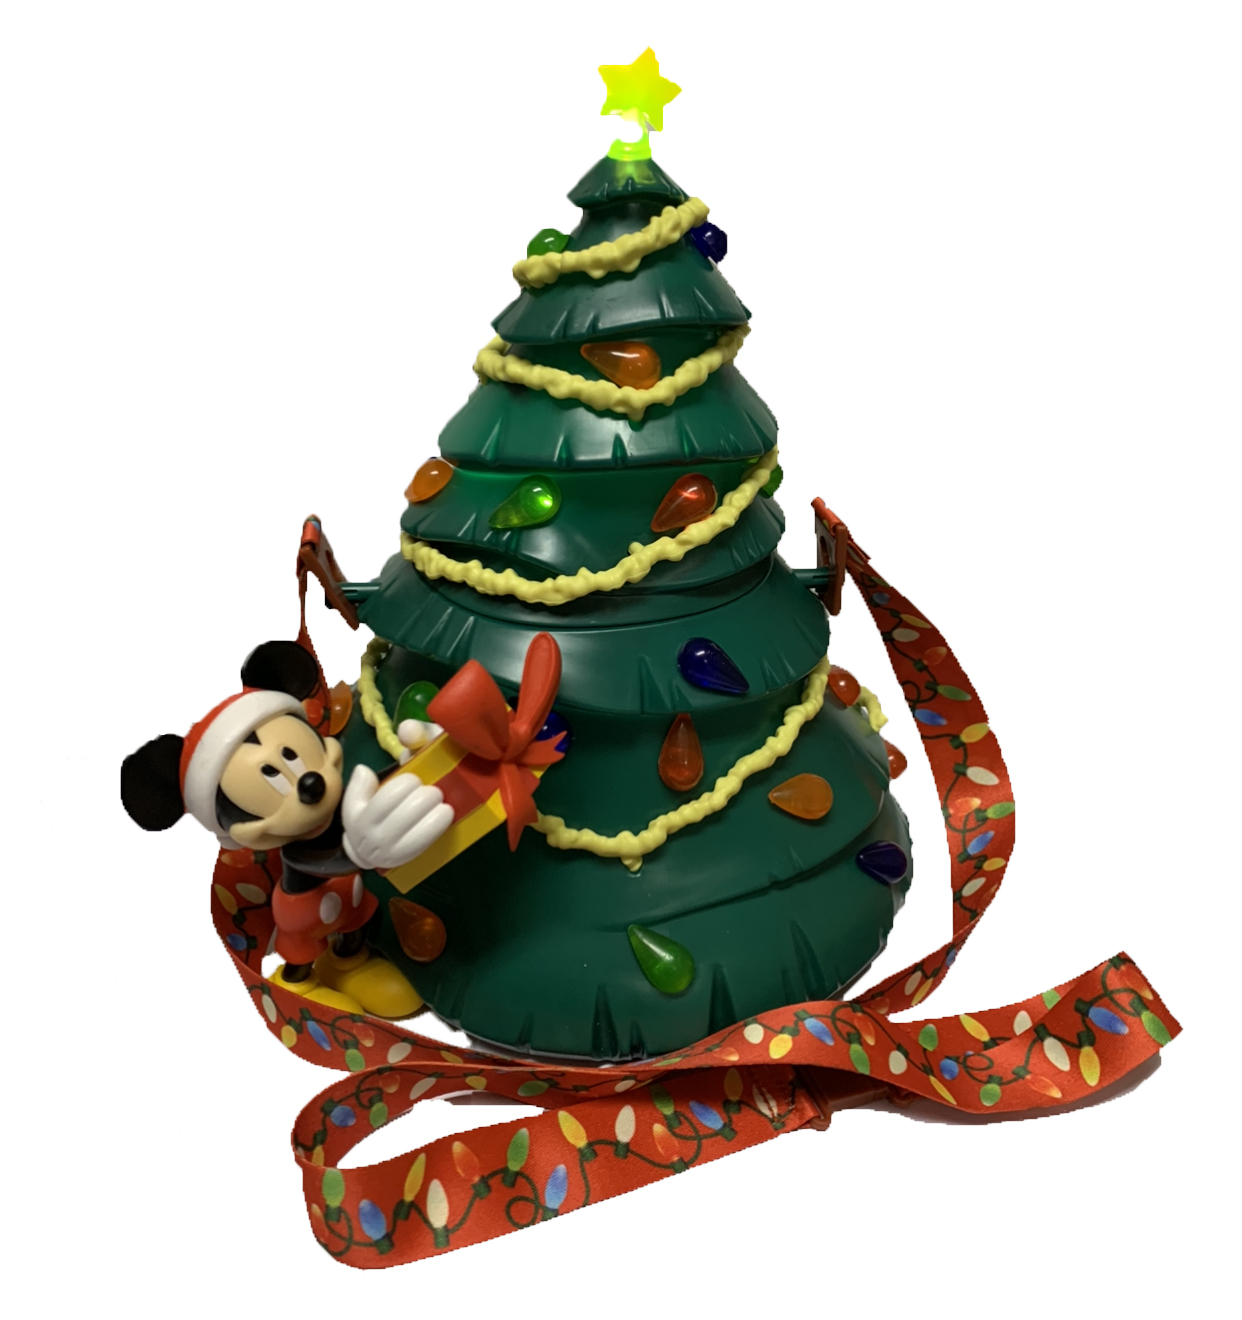 Disney Popcorn Bucket - Mickey Mouse Christmas Tree - Light Up